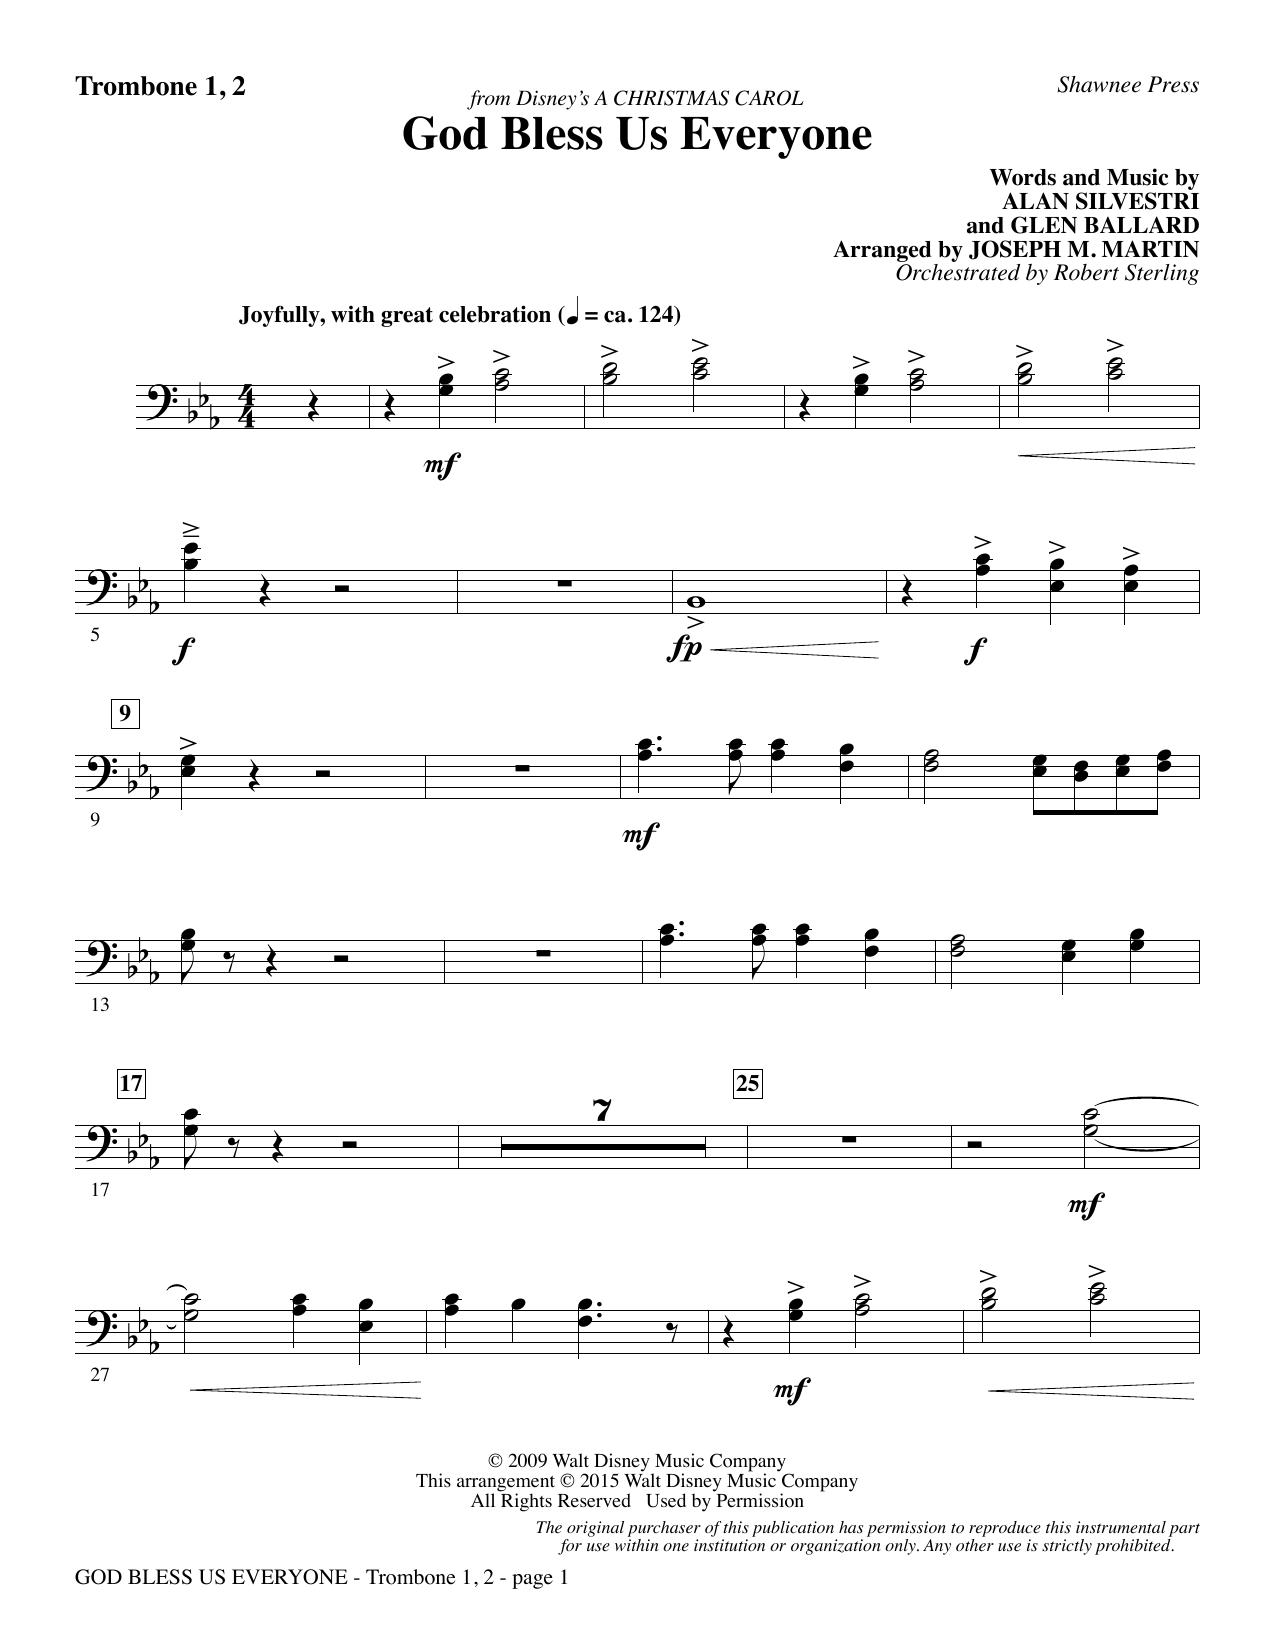 God Bless Us Everyone (from Disney's A Christmas Carol) - Trombone 1 & 2 | Sheet Music Direct